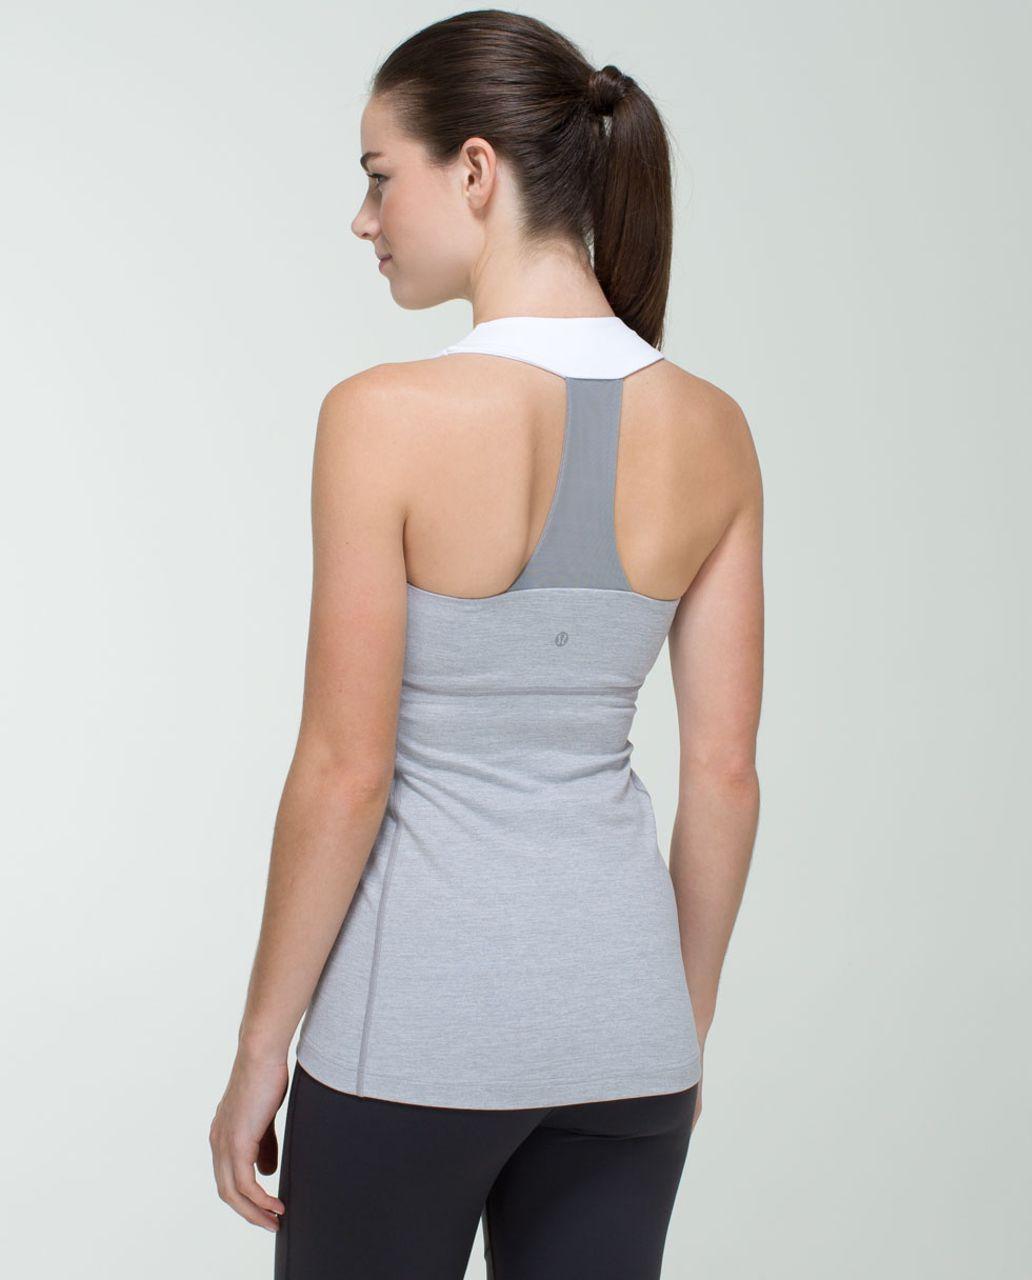 Lululemon Scoop Neck Tank *Luon - Heathered Medium Grey / White / Ambient Grey